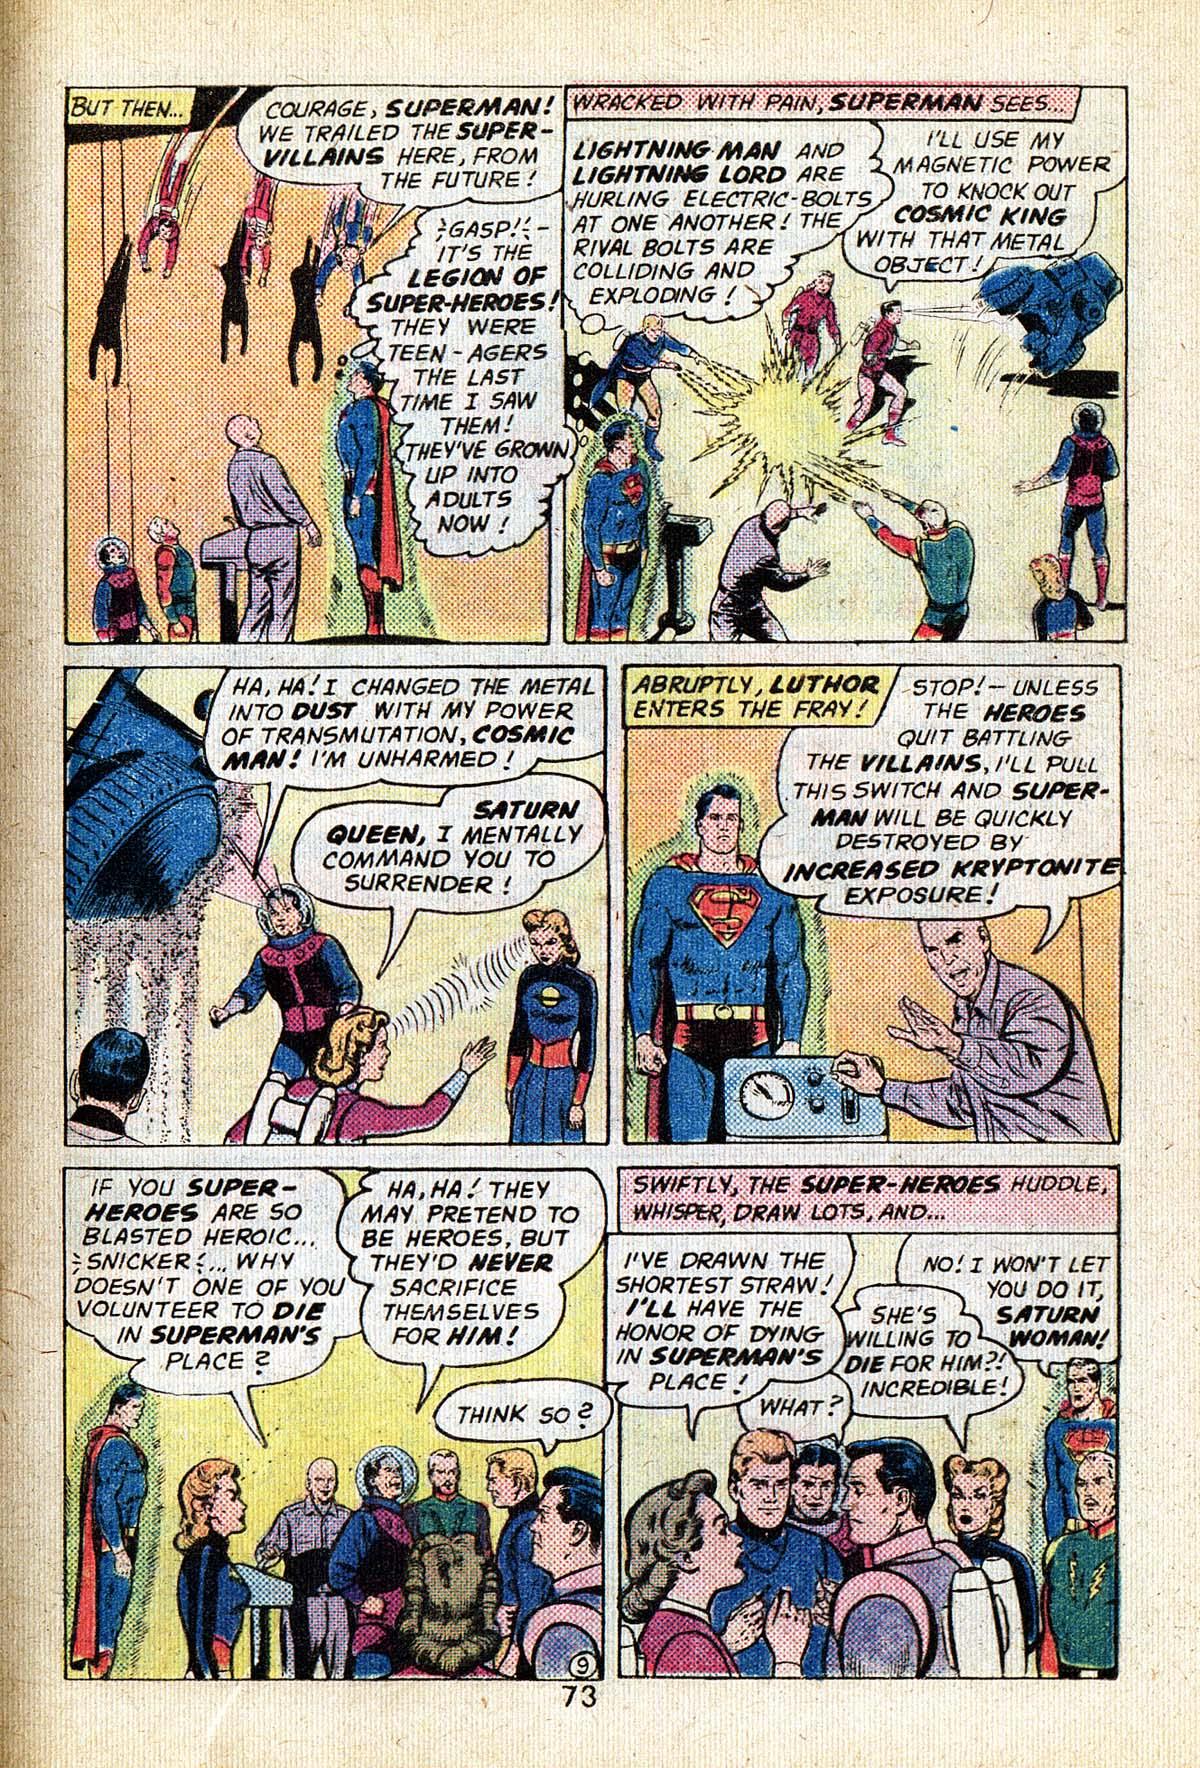 Read online Adventure Comics (1938) comic -  Issue #494 - 73